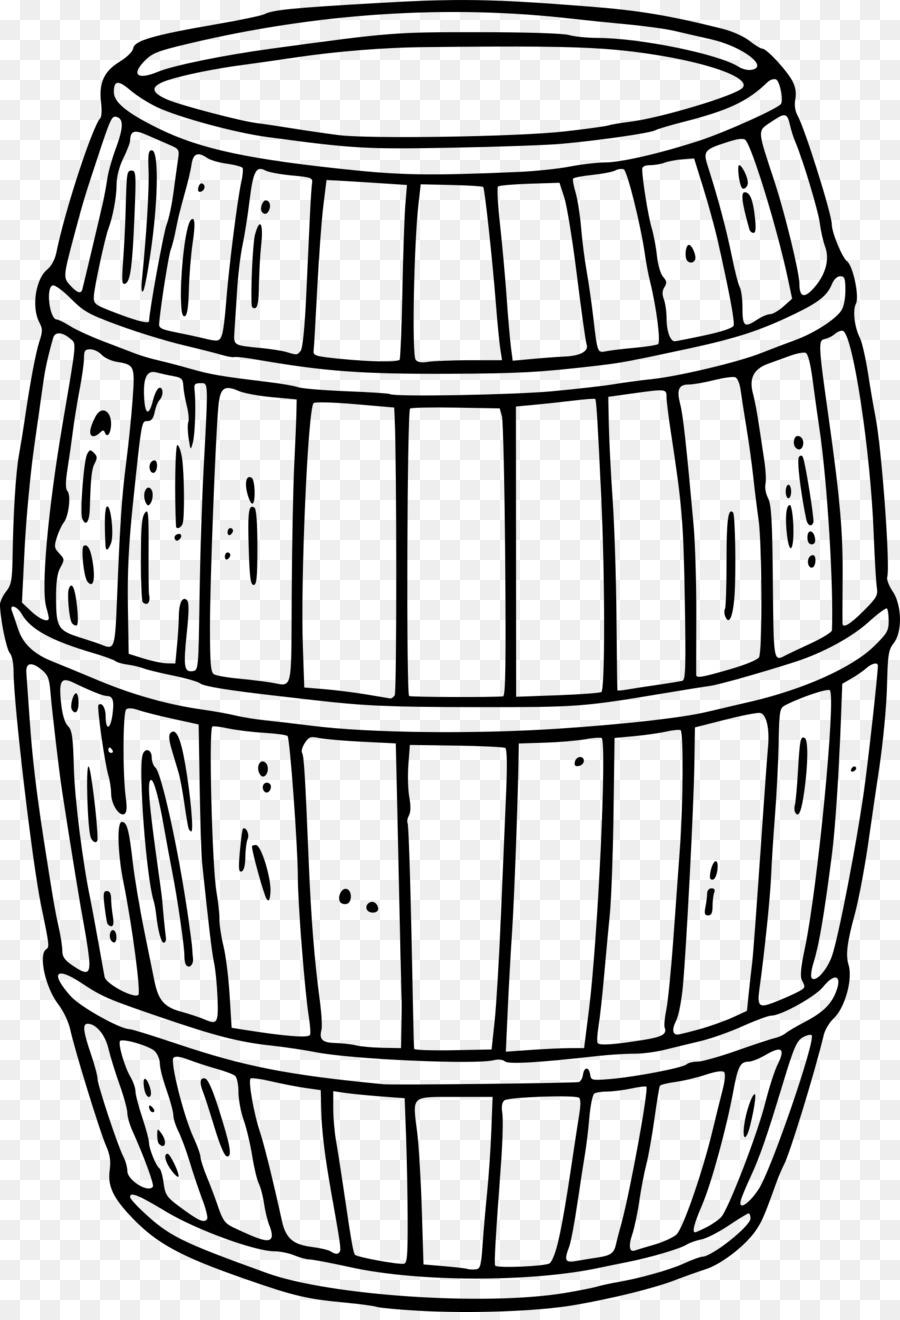 Bourbon barrel clipart svg library download Barrel Line Art png download - 1646*2400 - Free Transparent Barrel ... svg library download